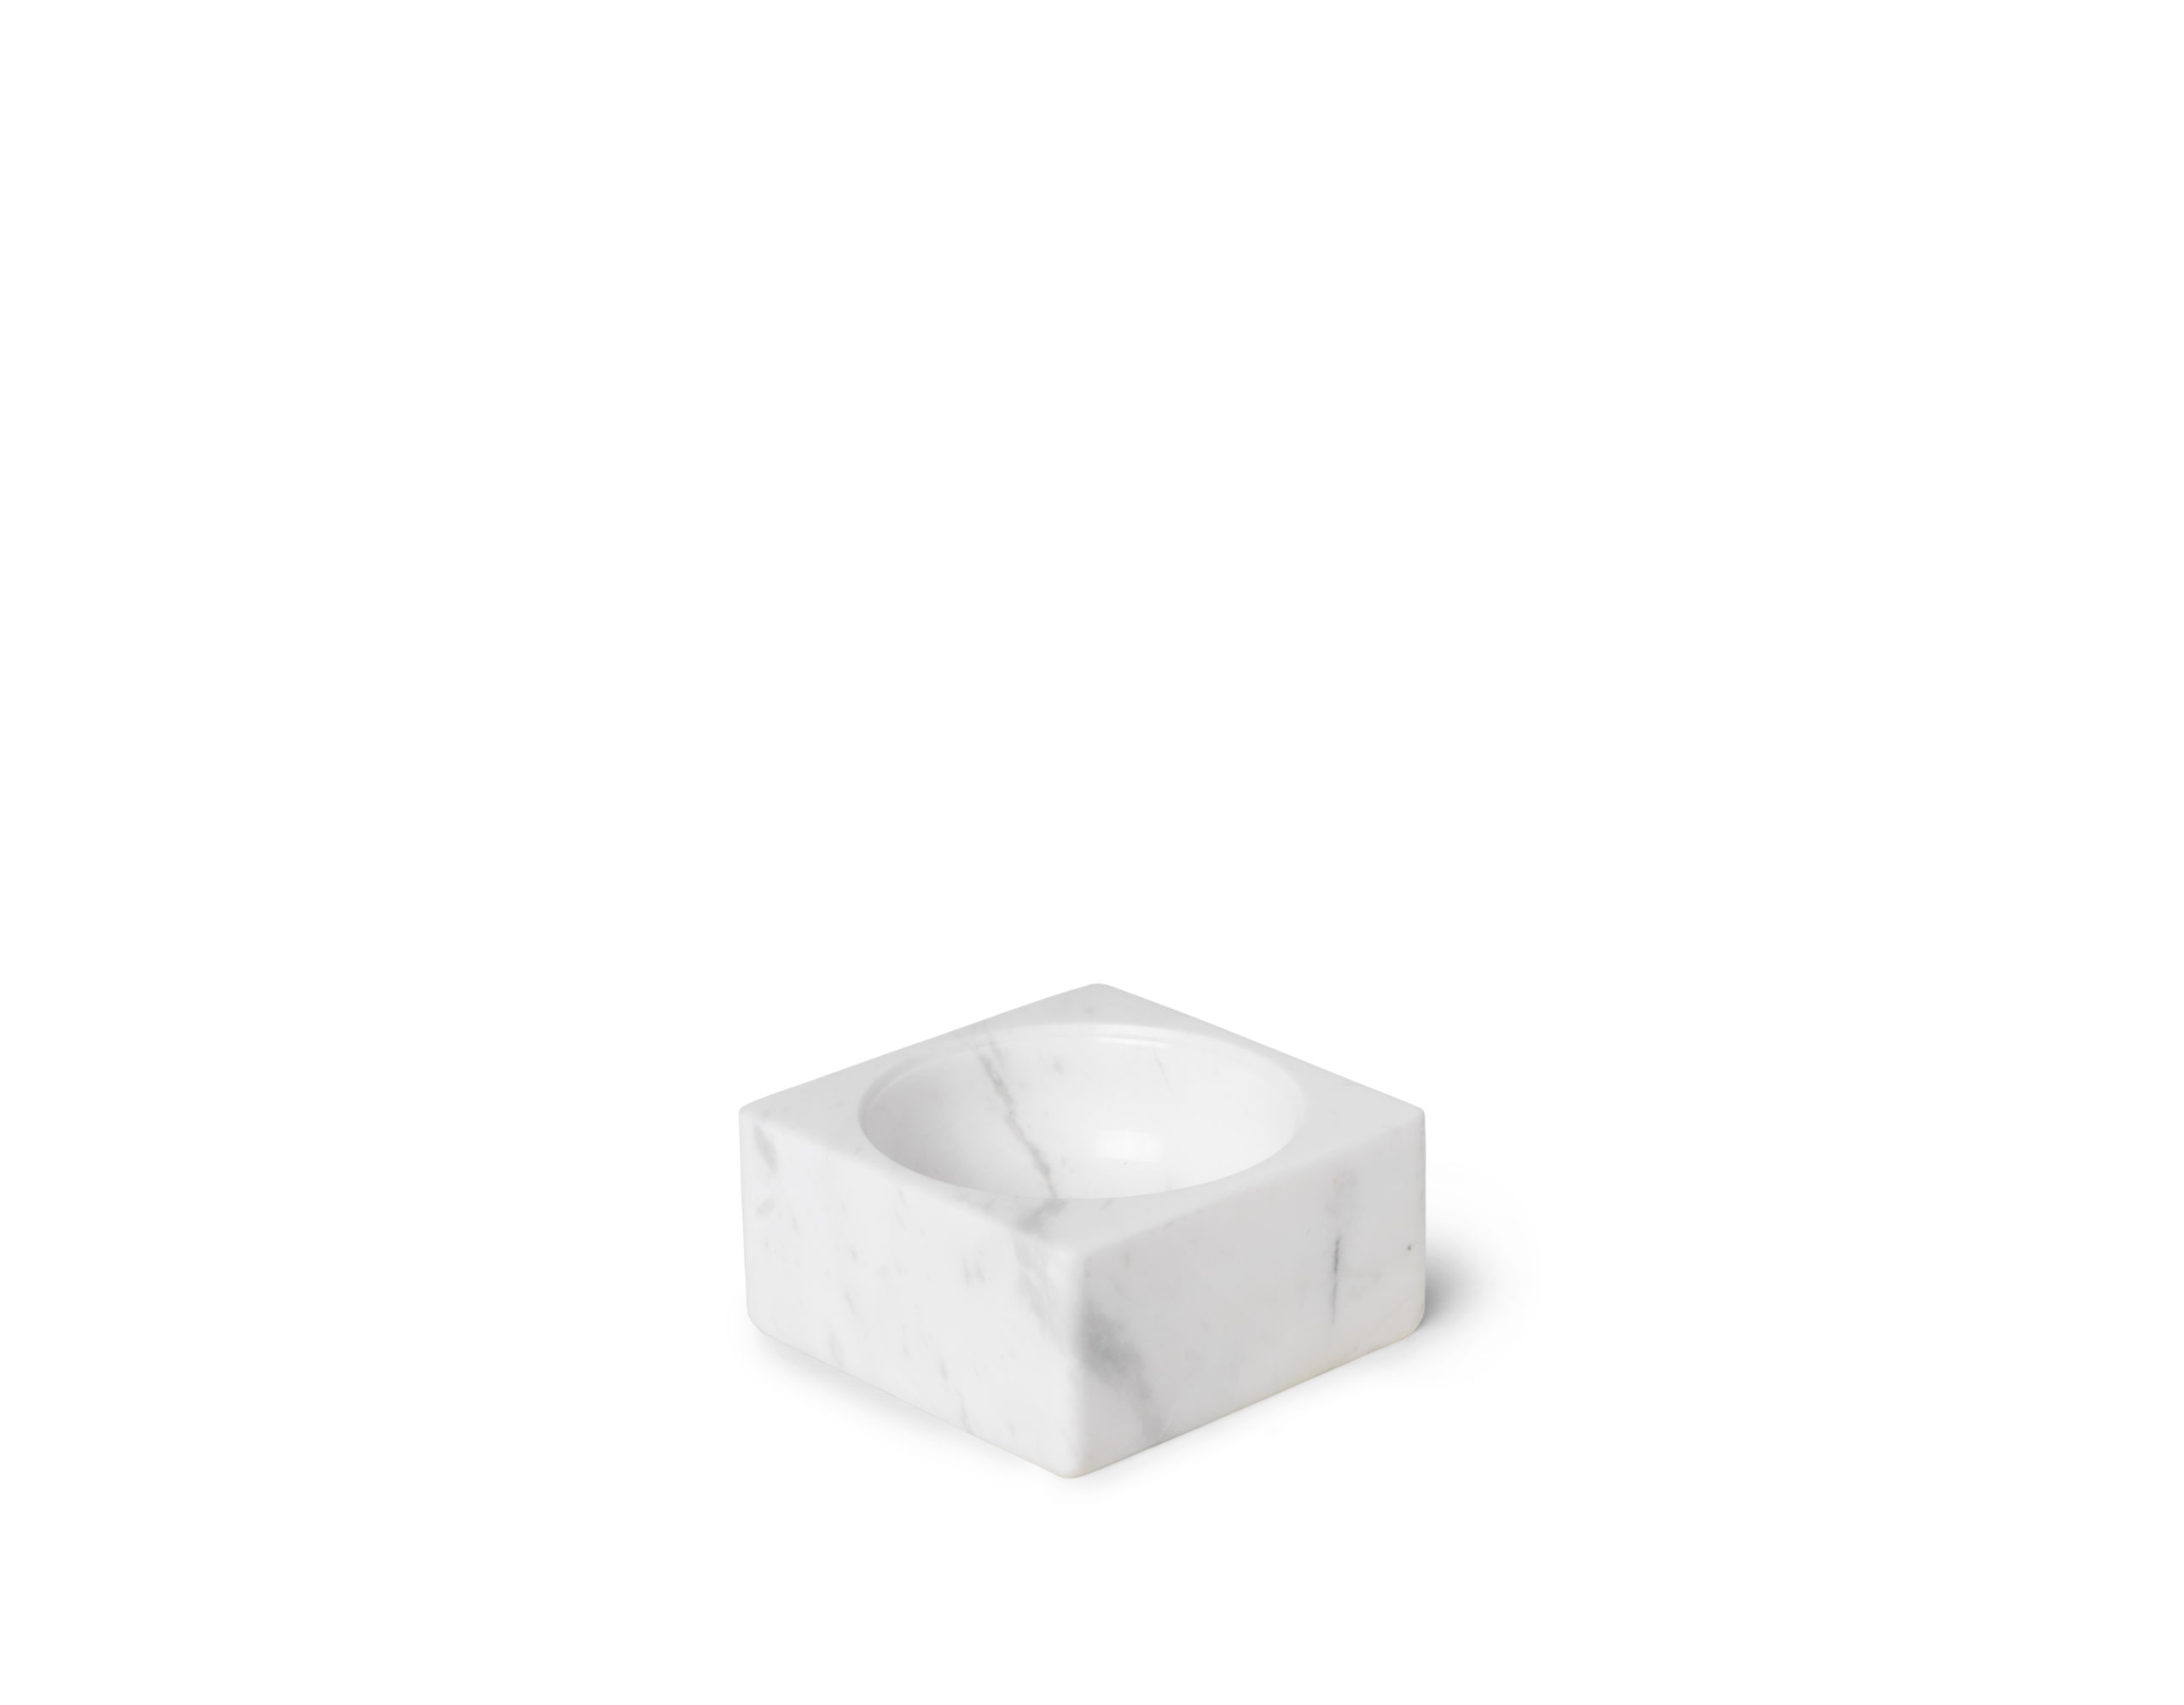 ARCHITECTMADE PK Mini White Marble Bowl Poul Kjærholm